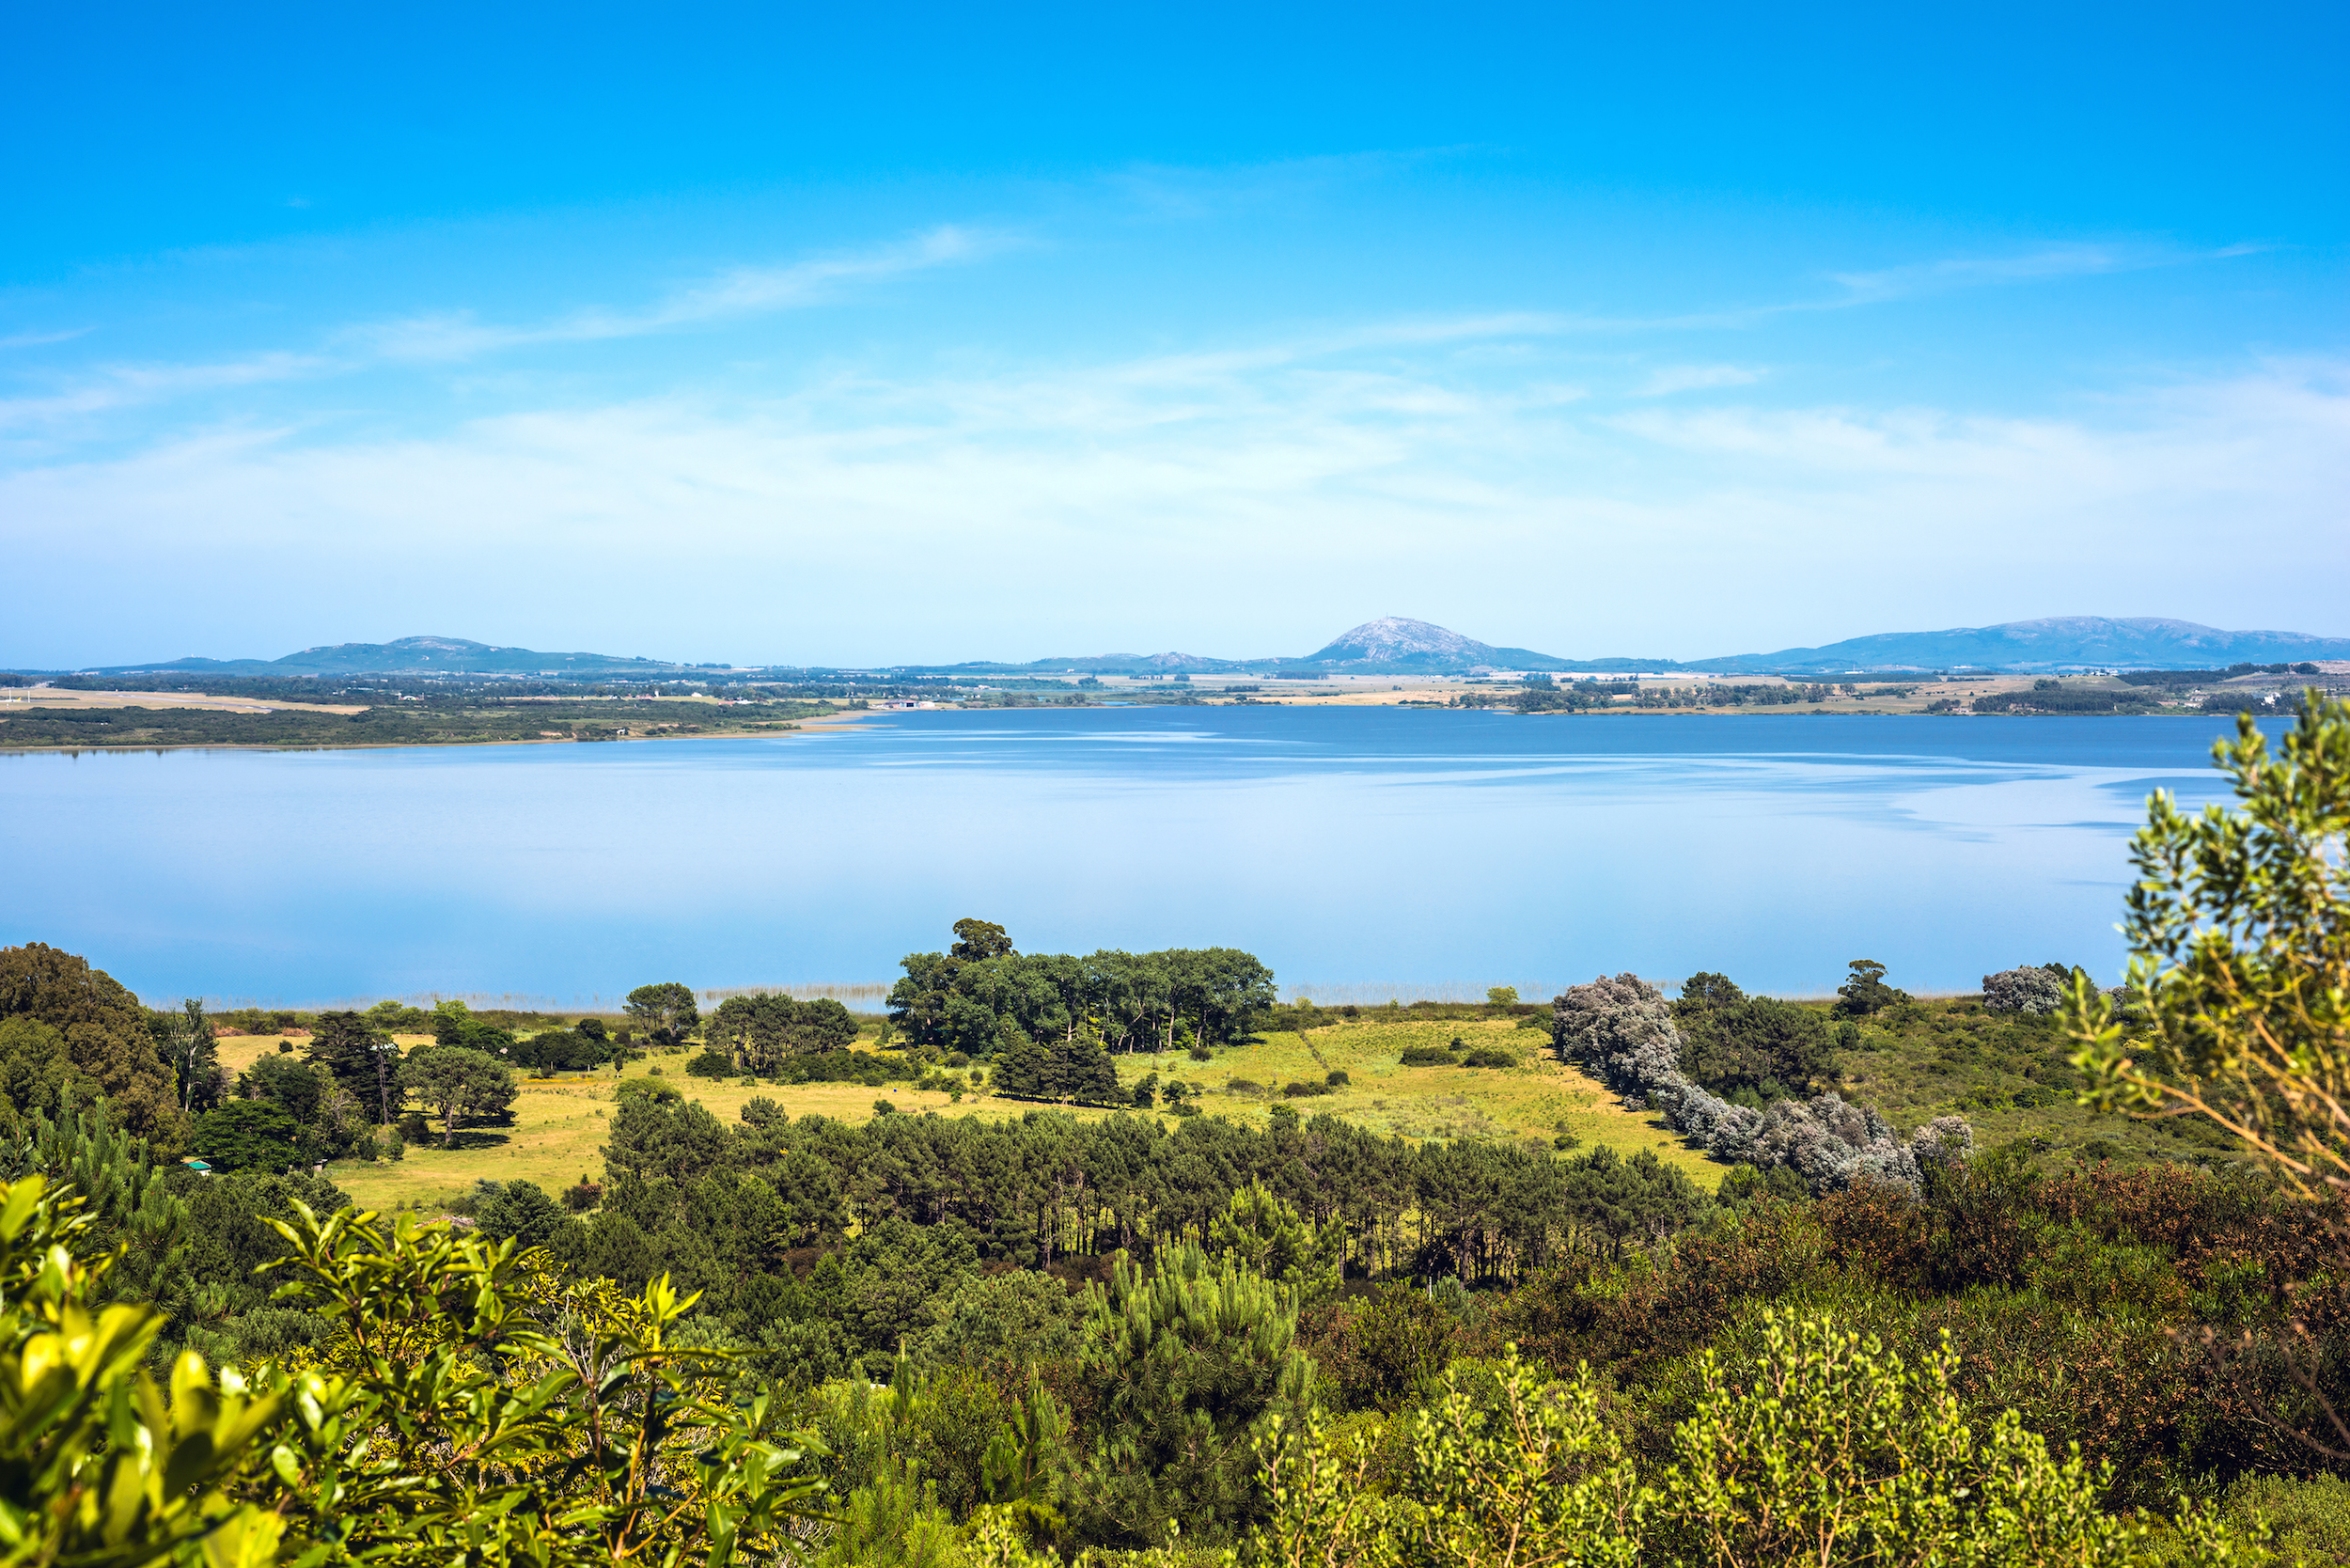 Laguna del Sauce - Maldonado - PVT Uruguay